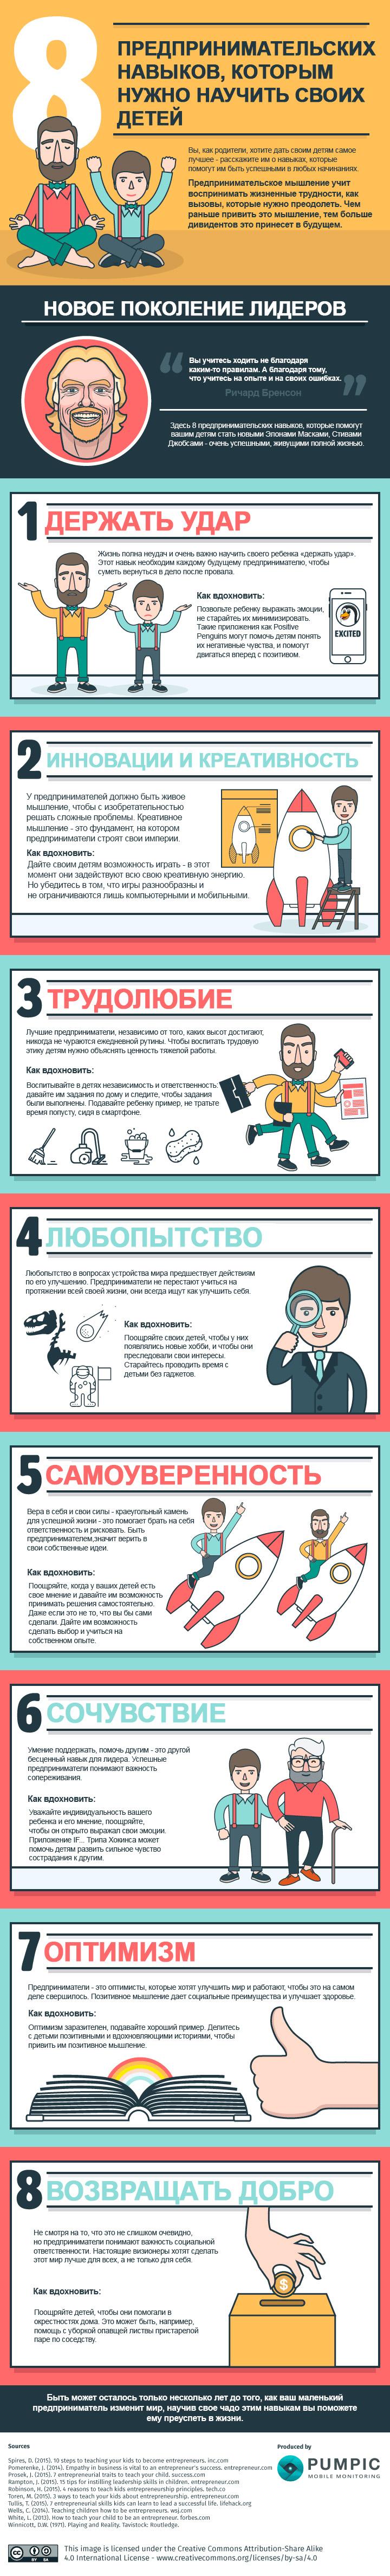 8 skills